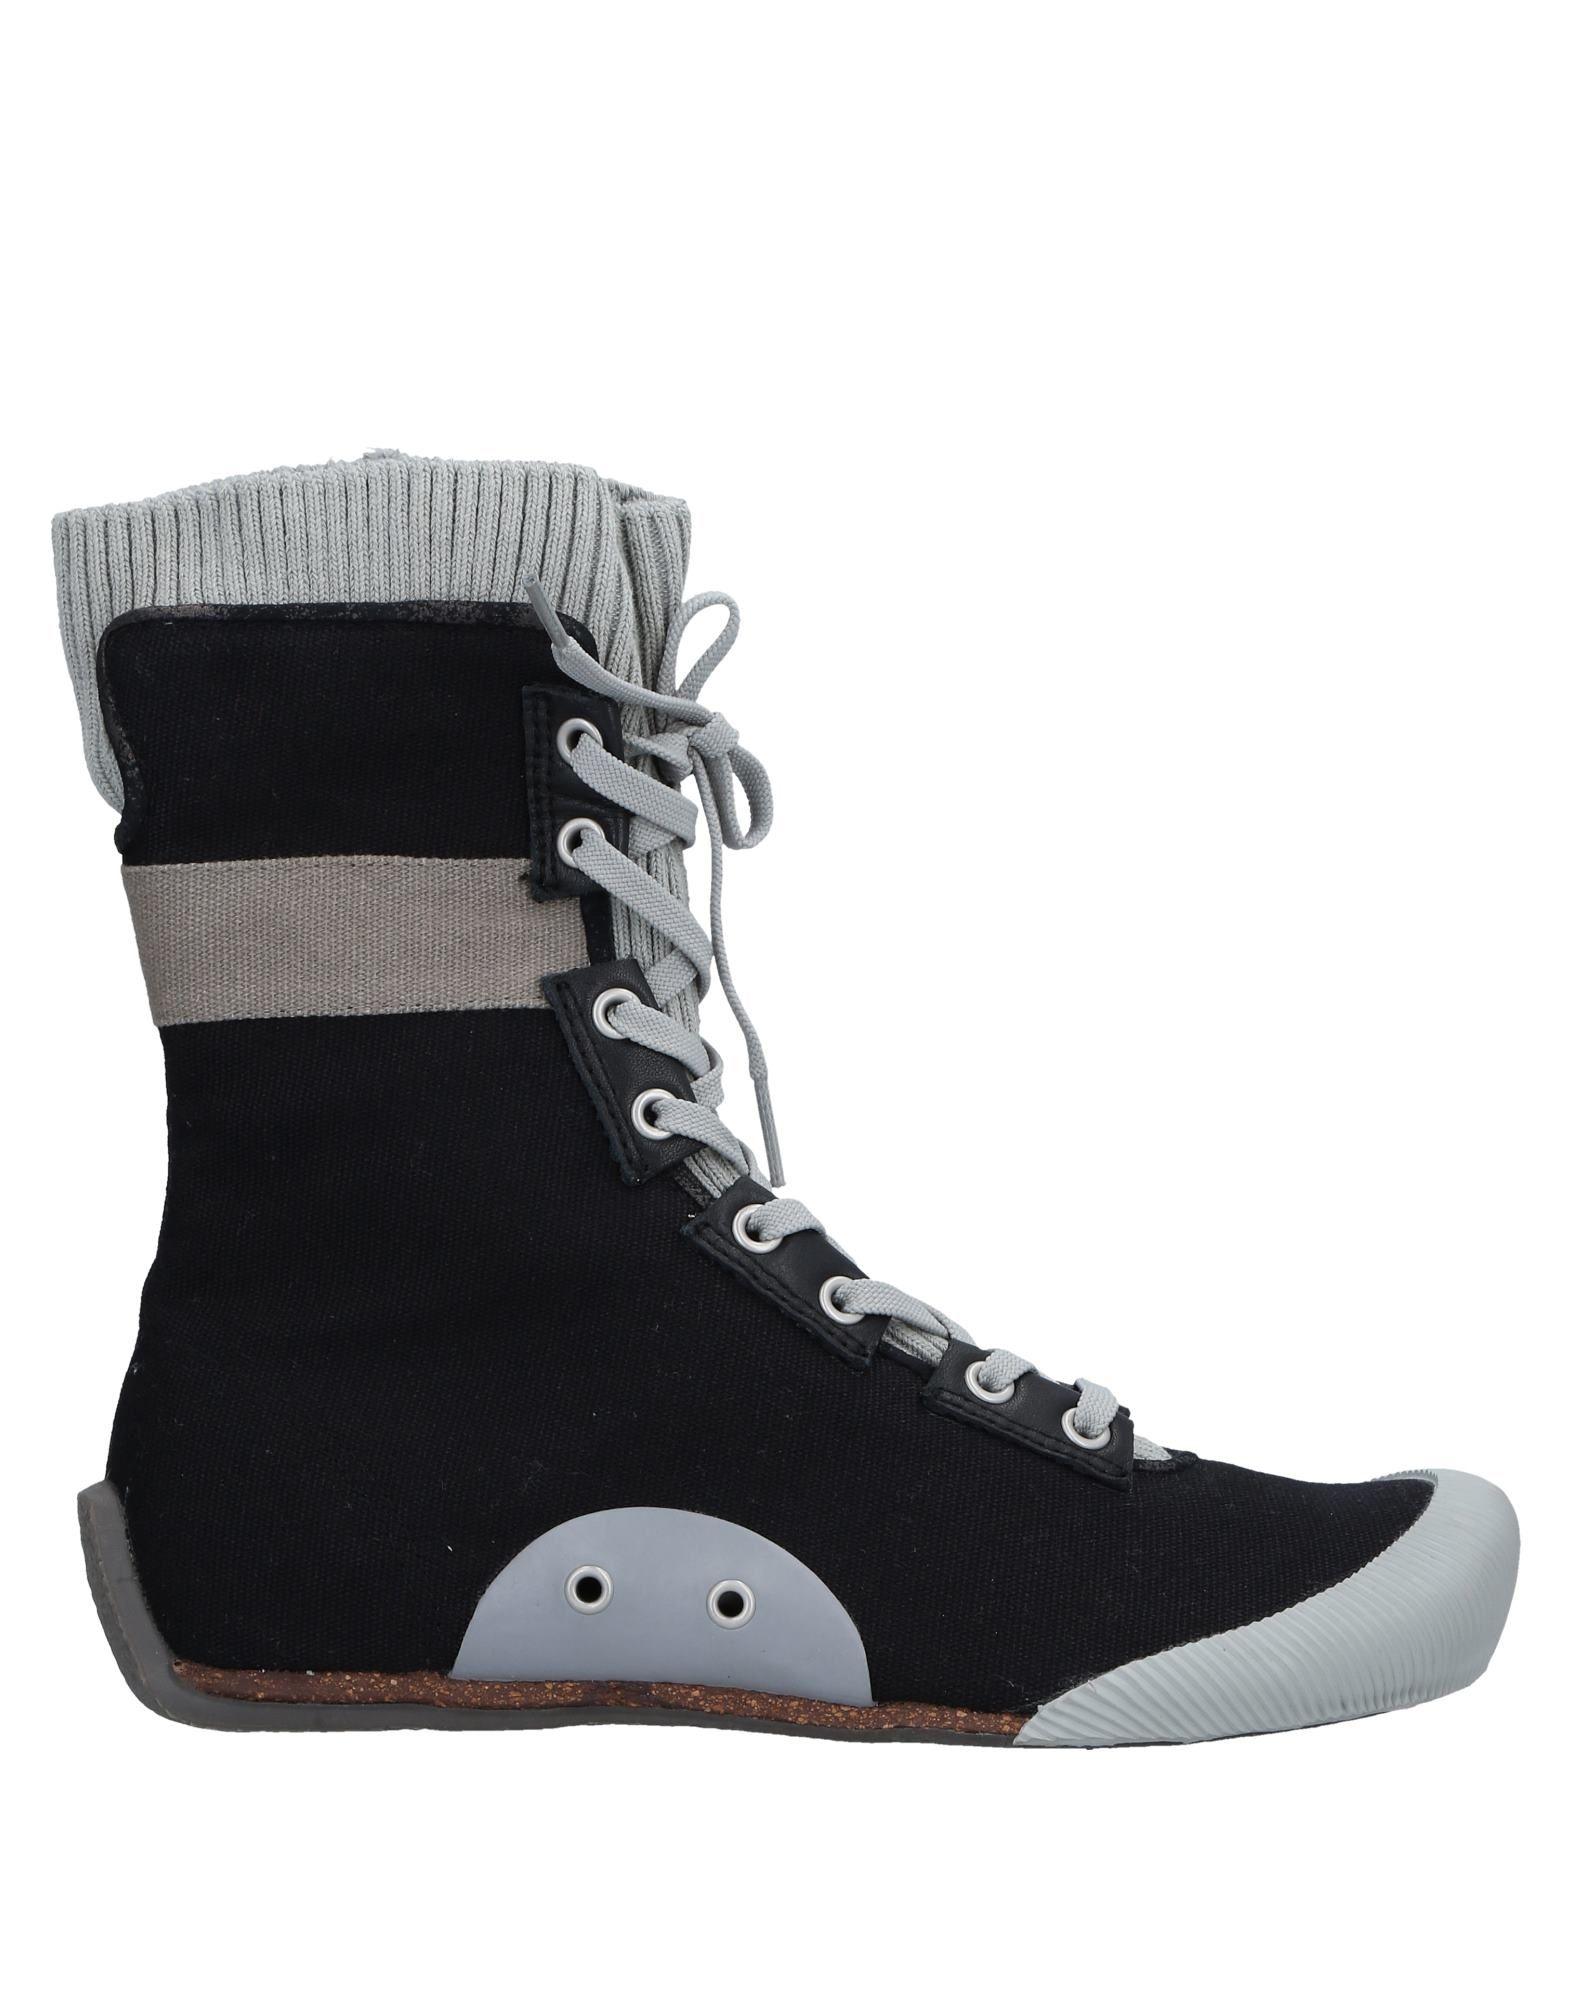 Diesel Sneakers Damen Damen Sneakers  11535600HB  b6ffc4